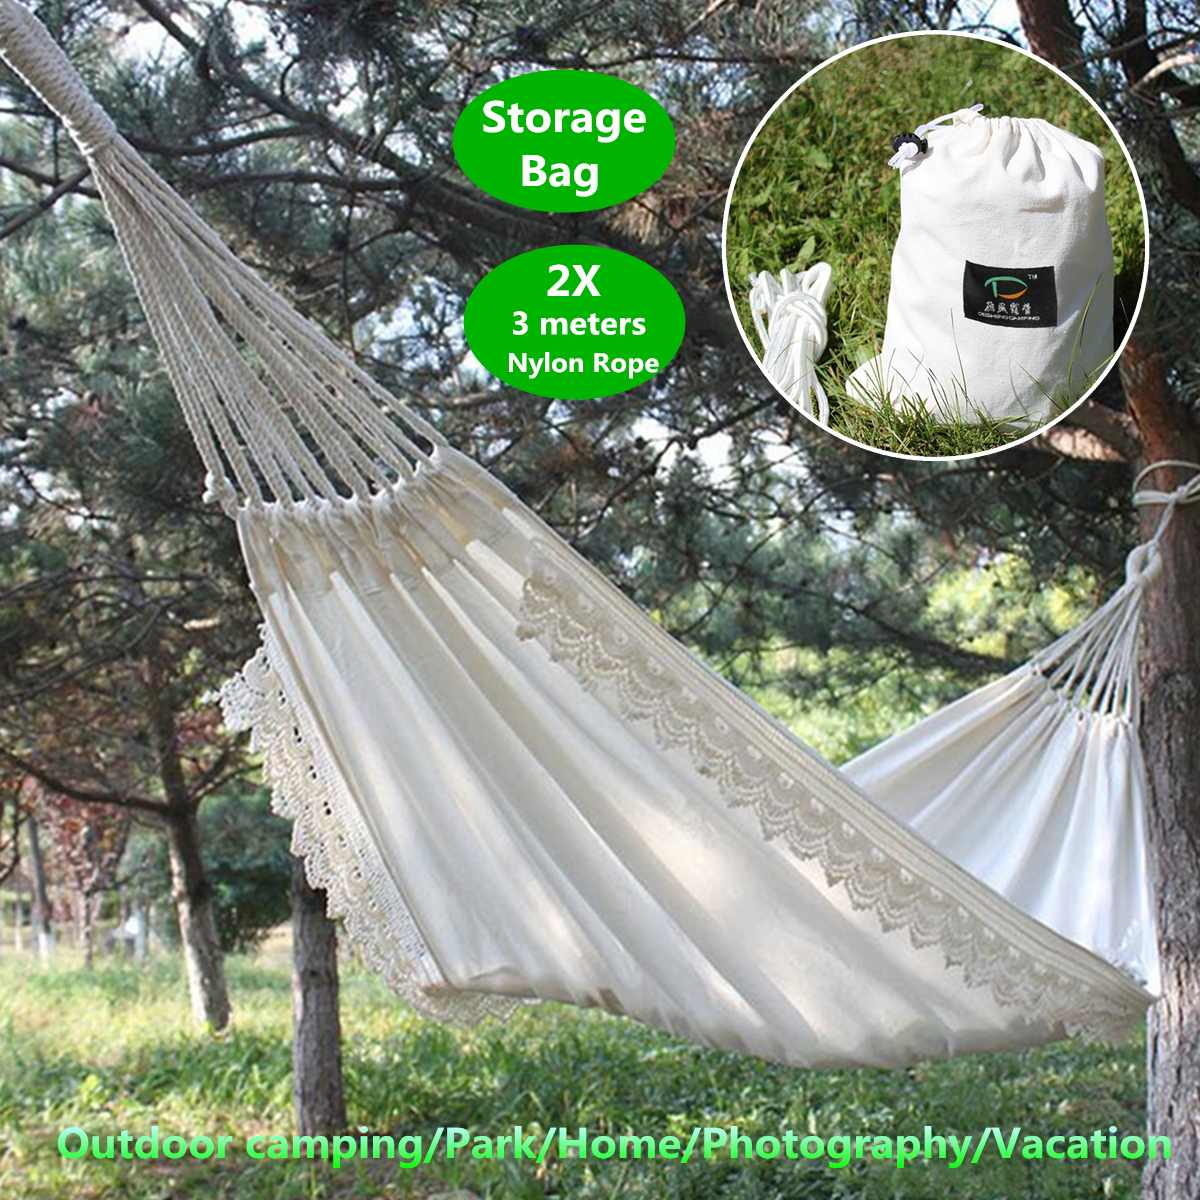 Fashion Lace Camping Parachute Hammock Survival Garden Outdoor Furniture Travel Double Hammock White Leisure Sleeping Hamaca